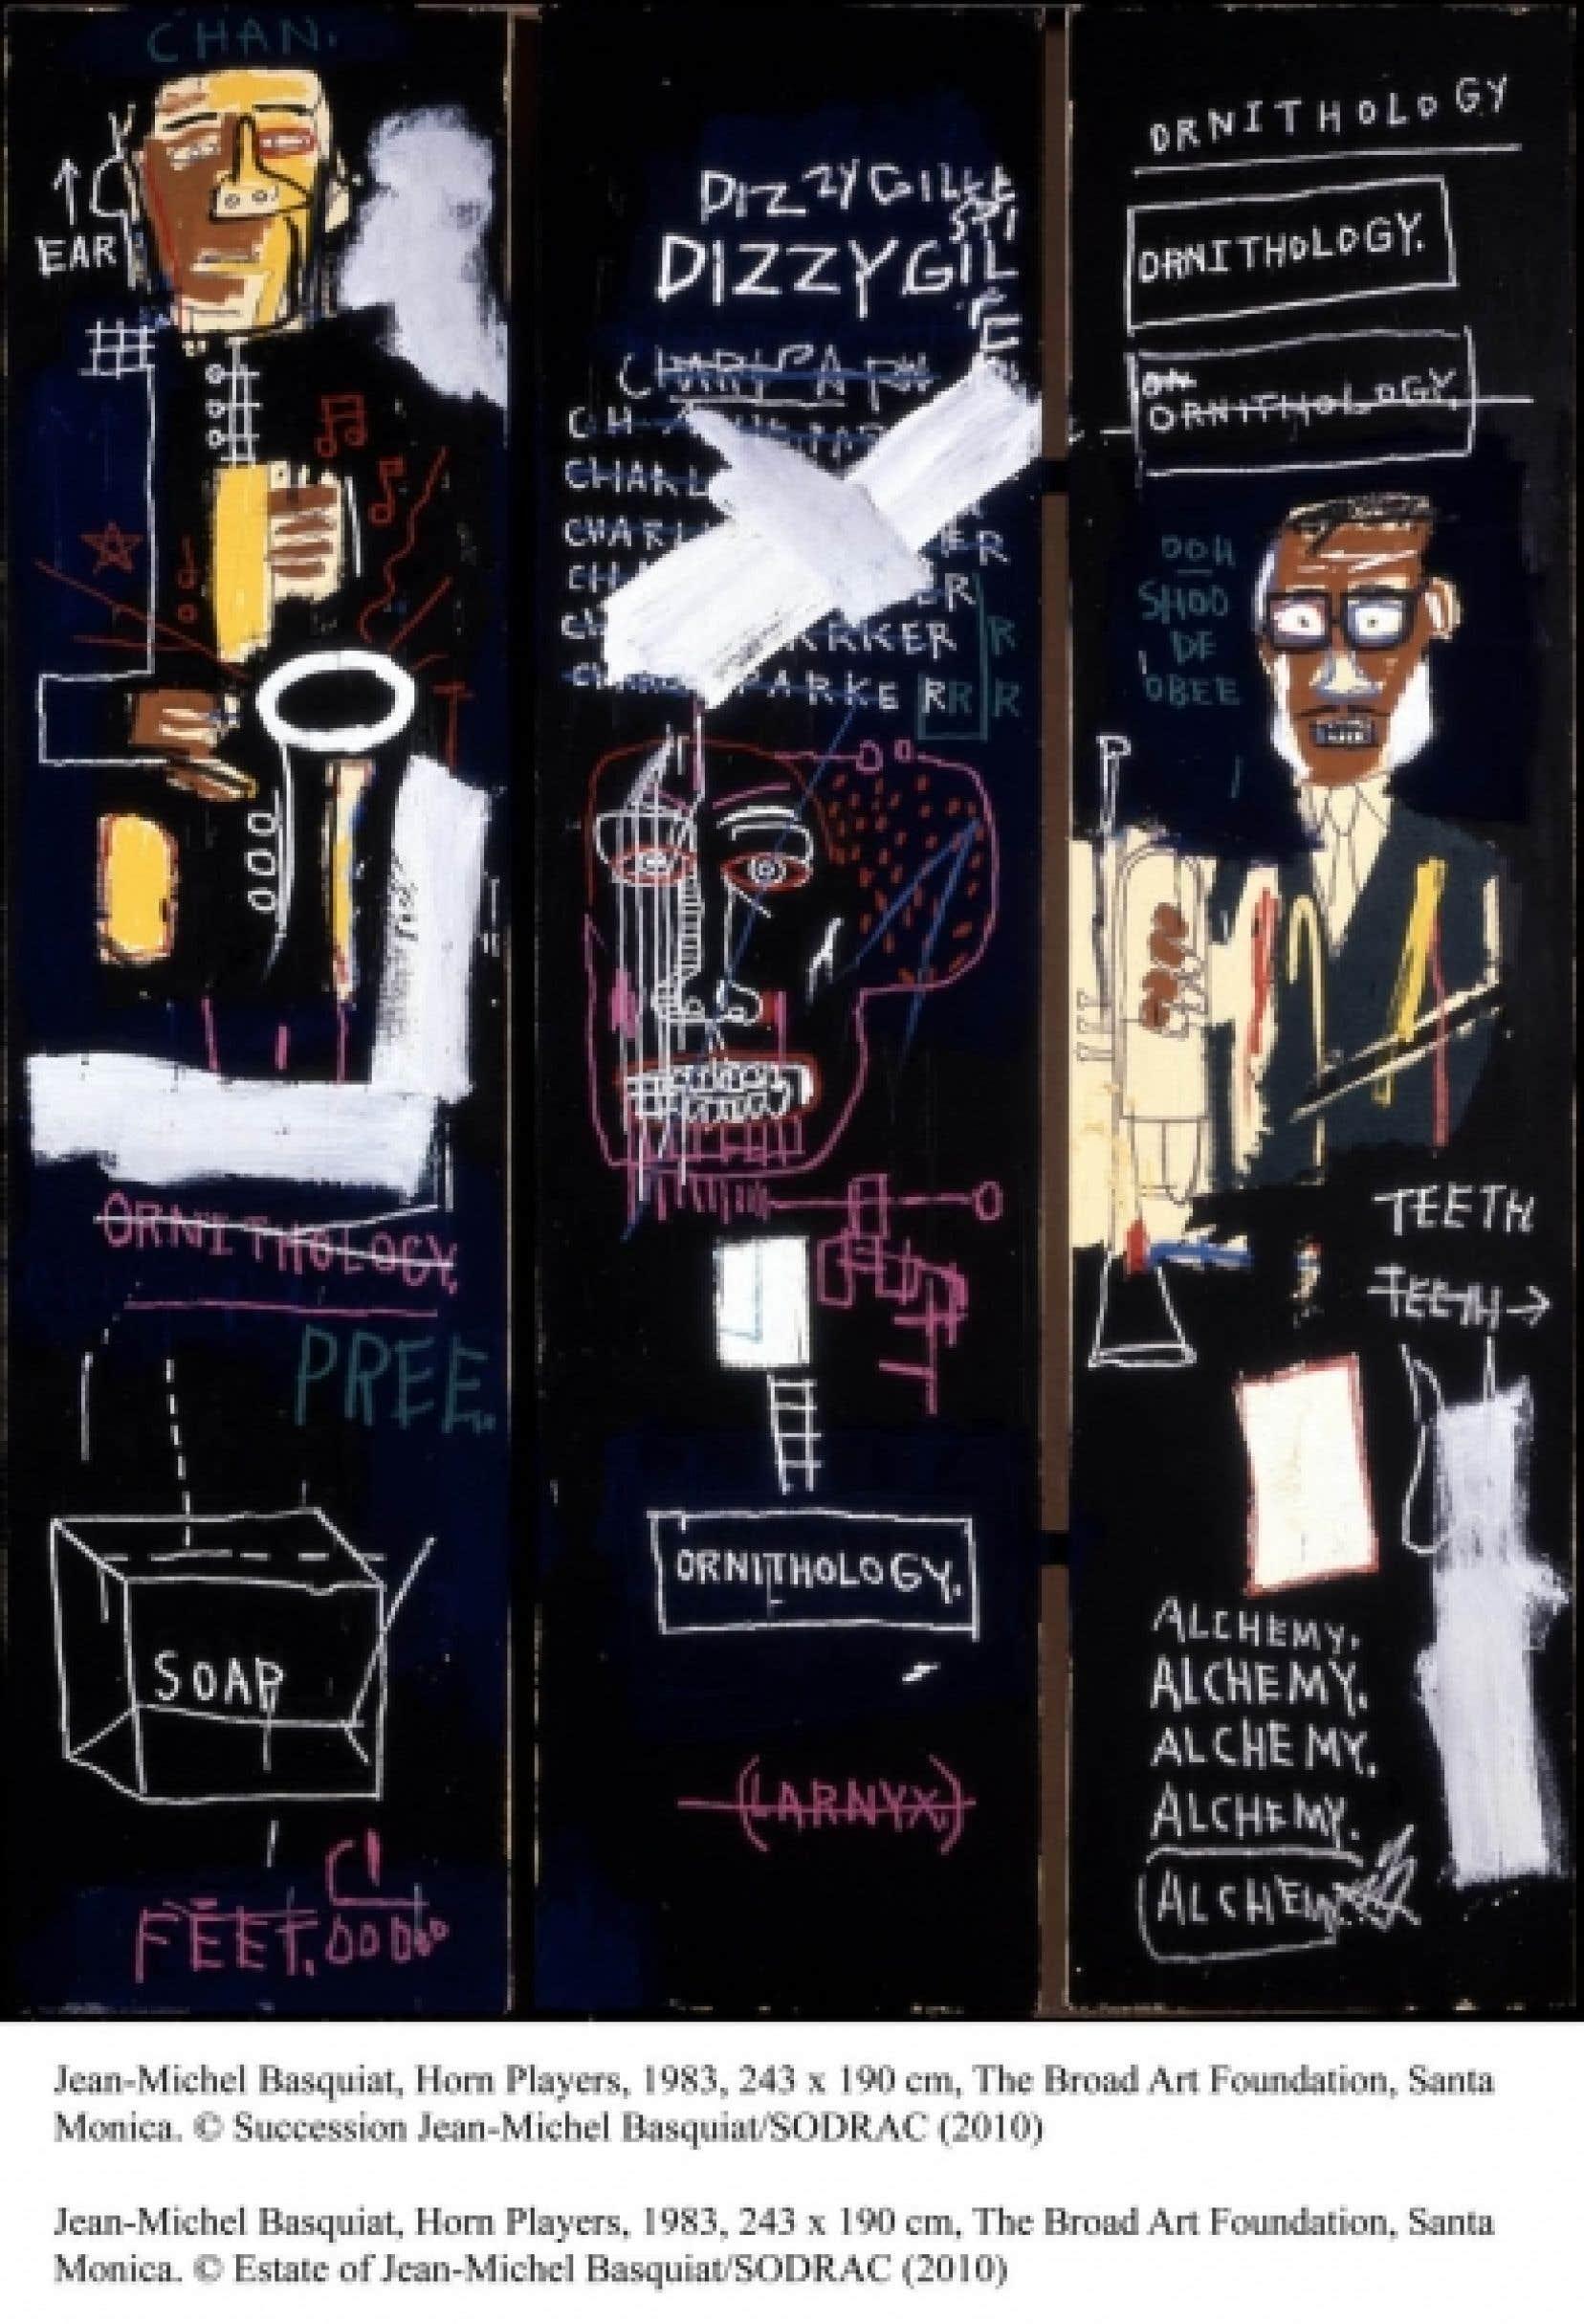 Horn Players, de Jean-Michel Basquiat, 1983, 243 x 190 cm. (The Broad Art Fondation, Santa Monica. Succession Jean-Michel Basquiat / SODRAC, 2010)